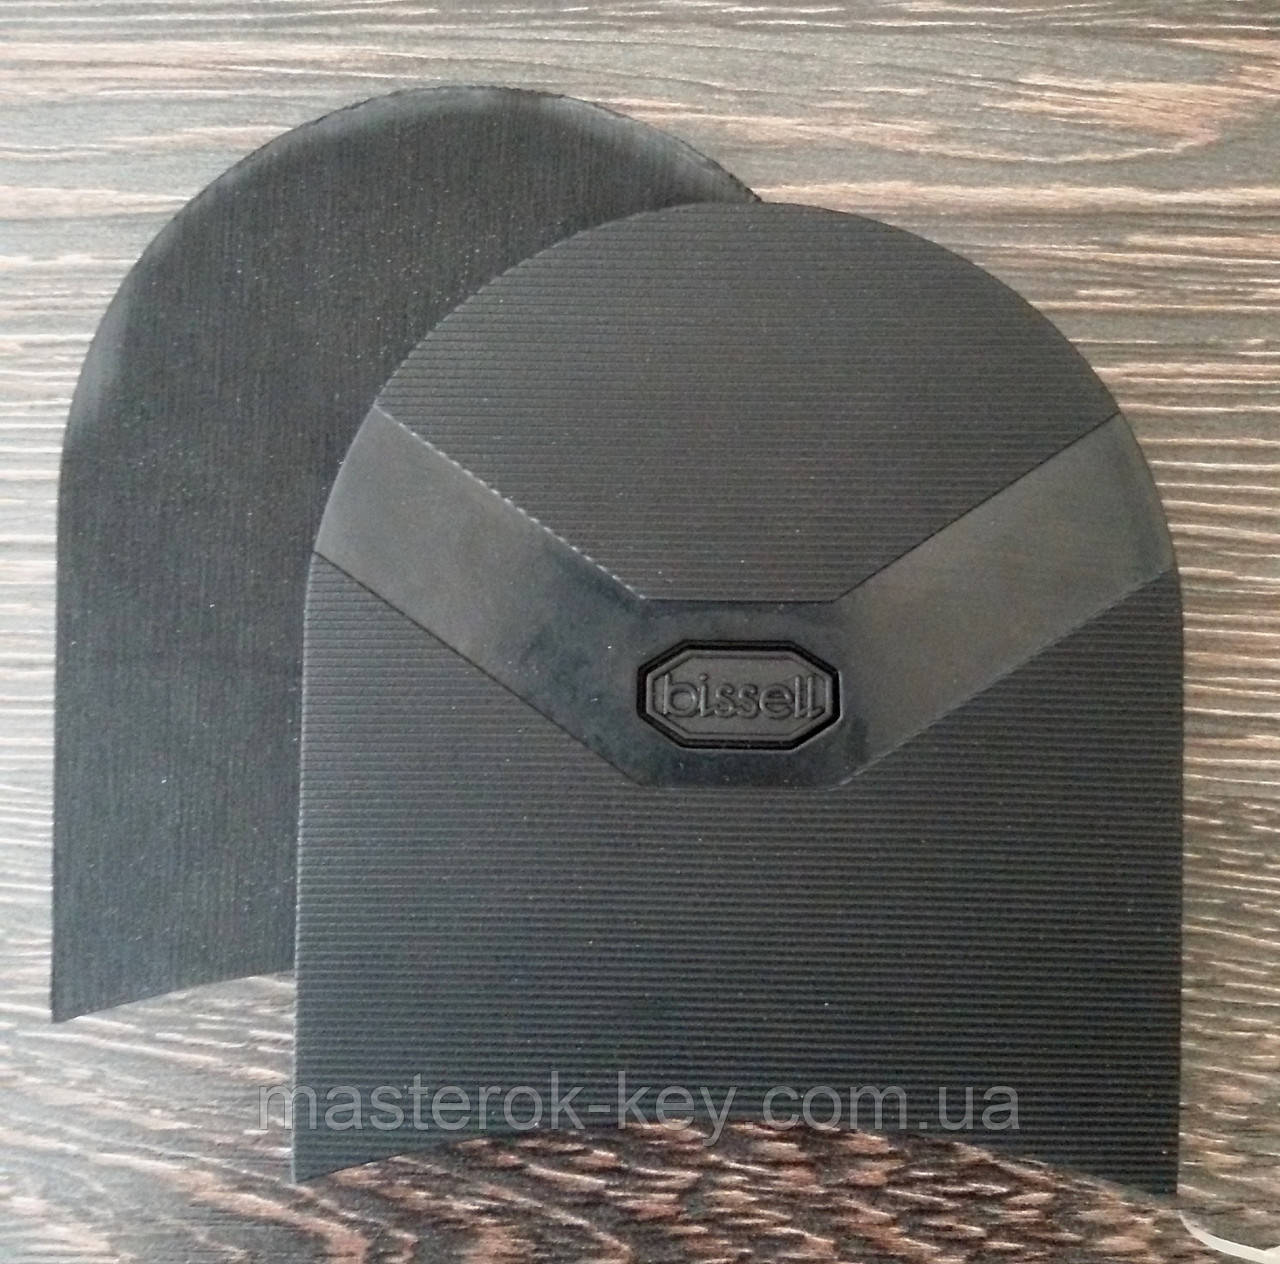 Набойки формованные BISSELL арт. RB-620 цвет черный